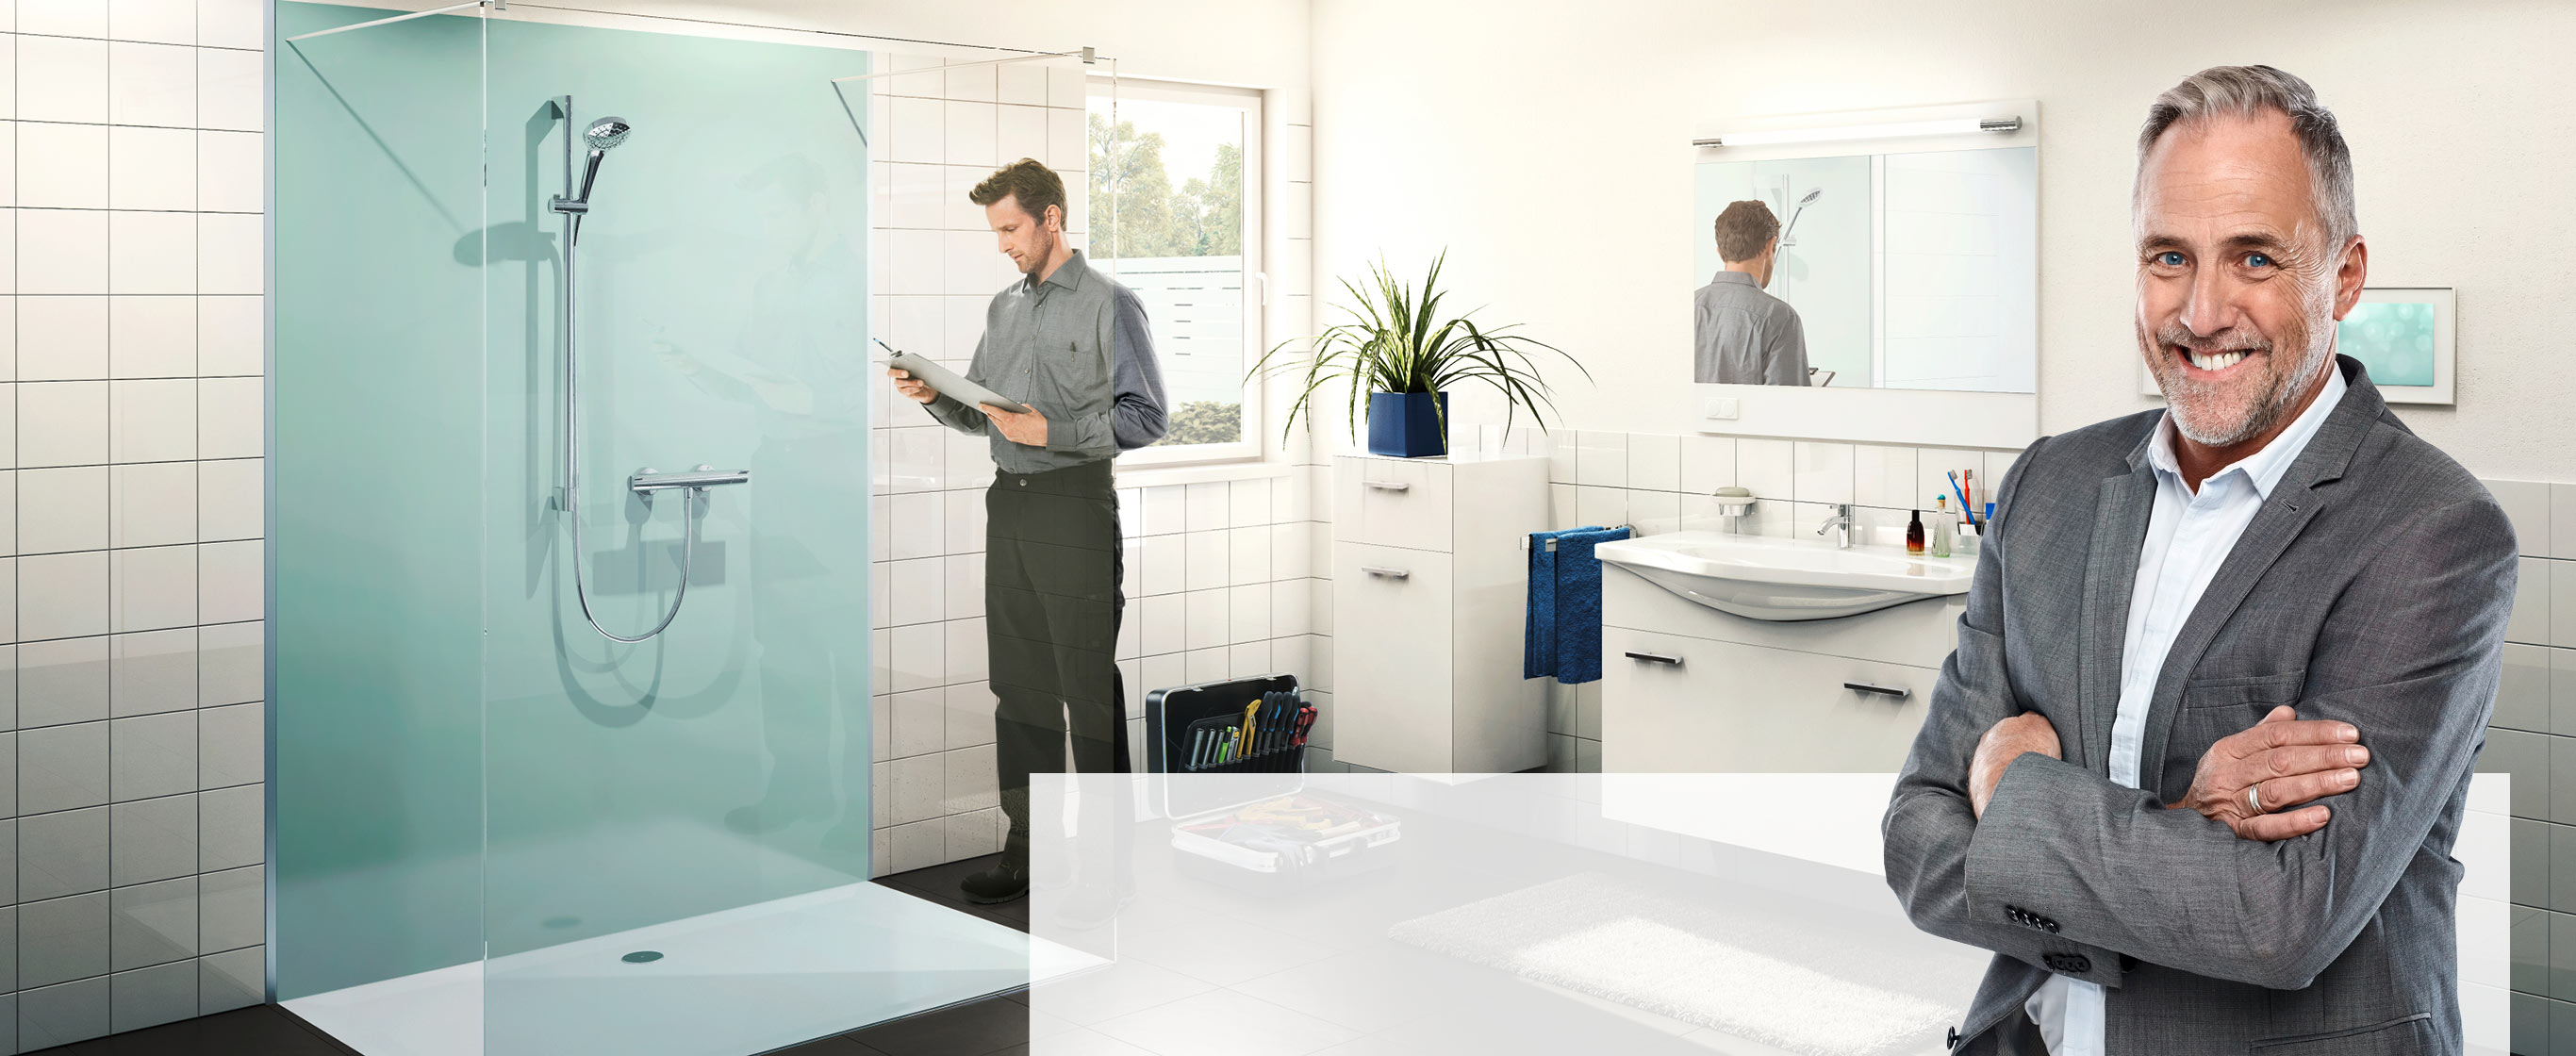 heizung sanieren modernisieren kempten rettinger gmbh. Black Bedroom Furniture Sets. Home Design Ideas